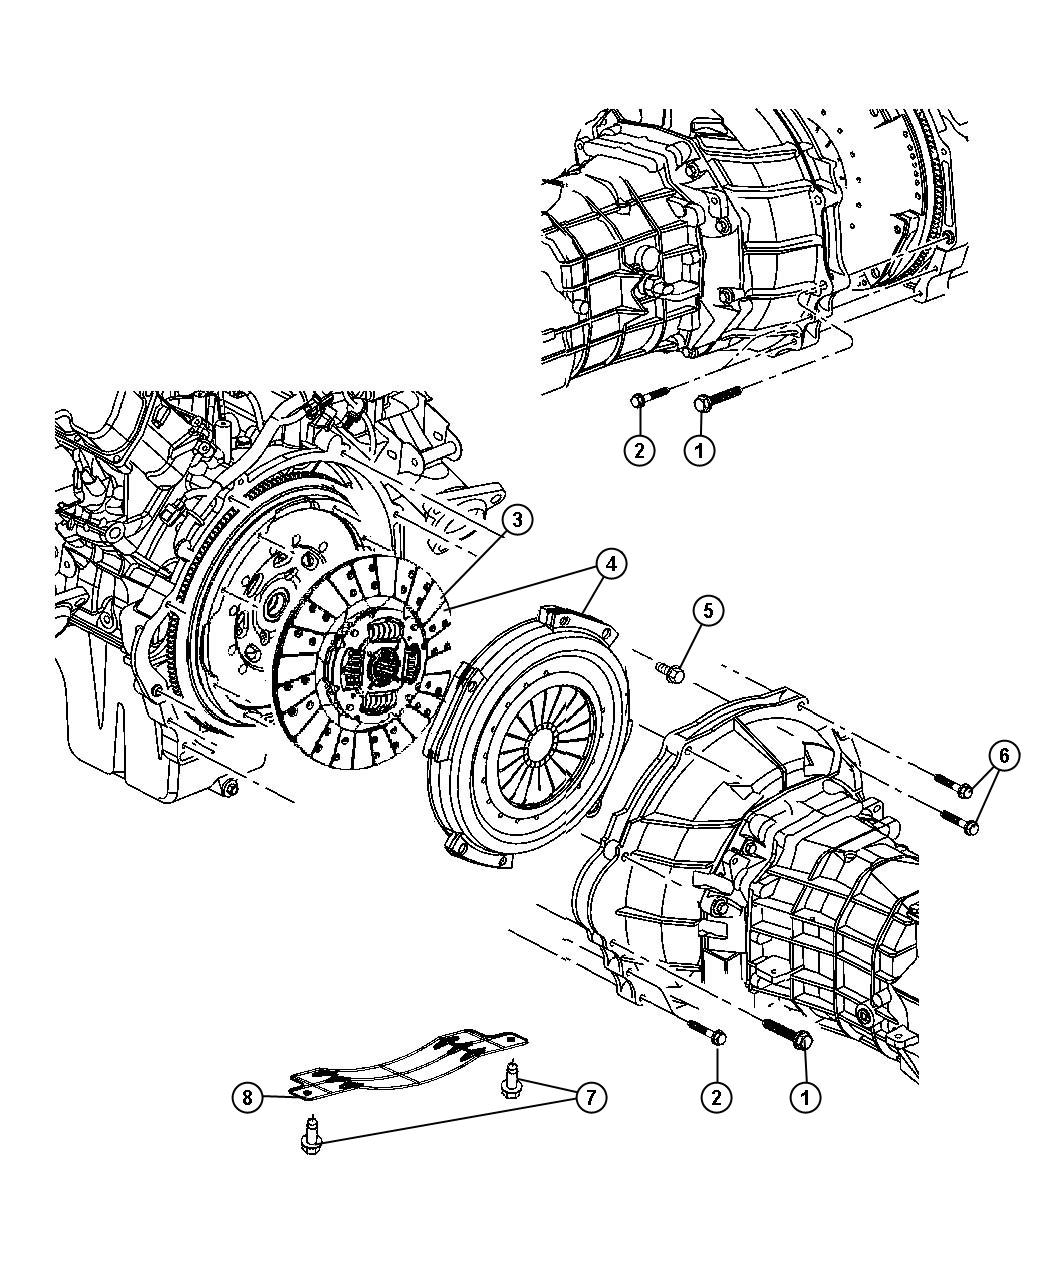 Dodge Ram 1500 Screw. Hex head. 437-14x2.75. Mounting